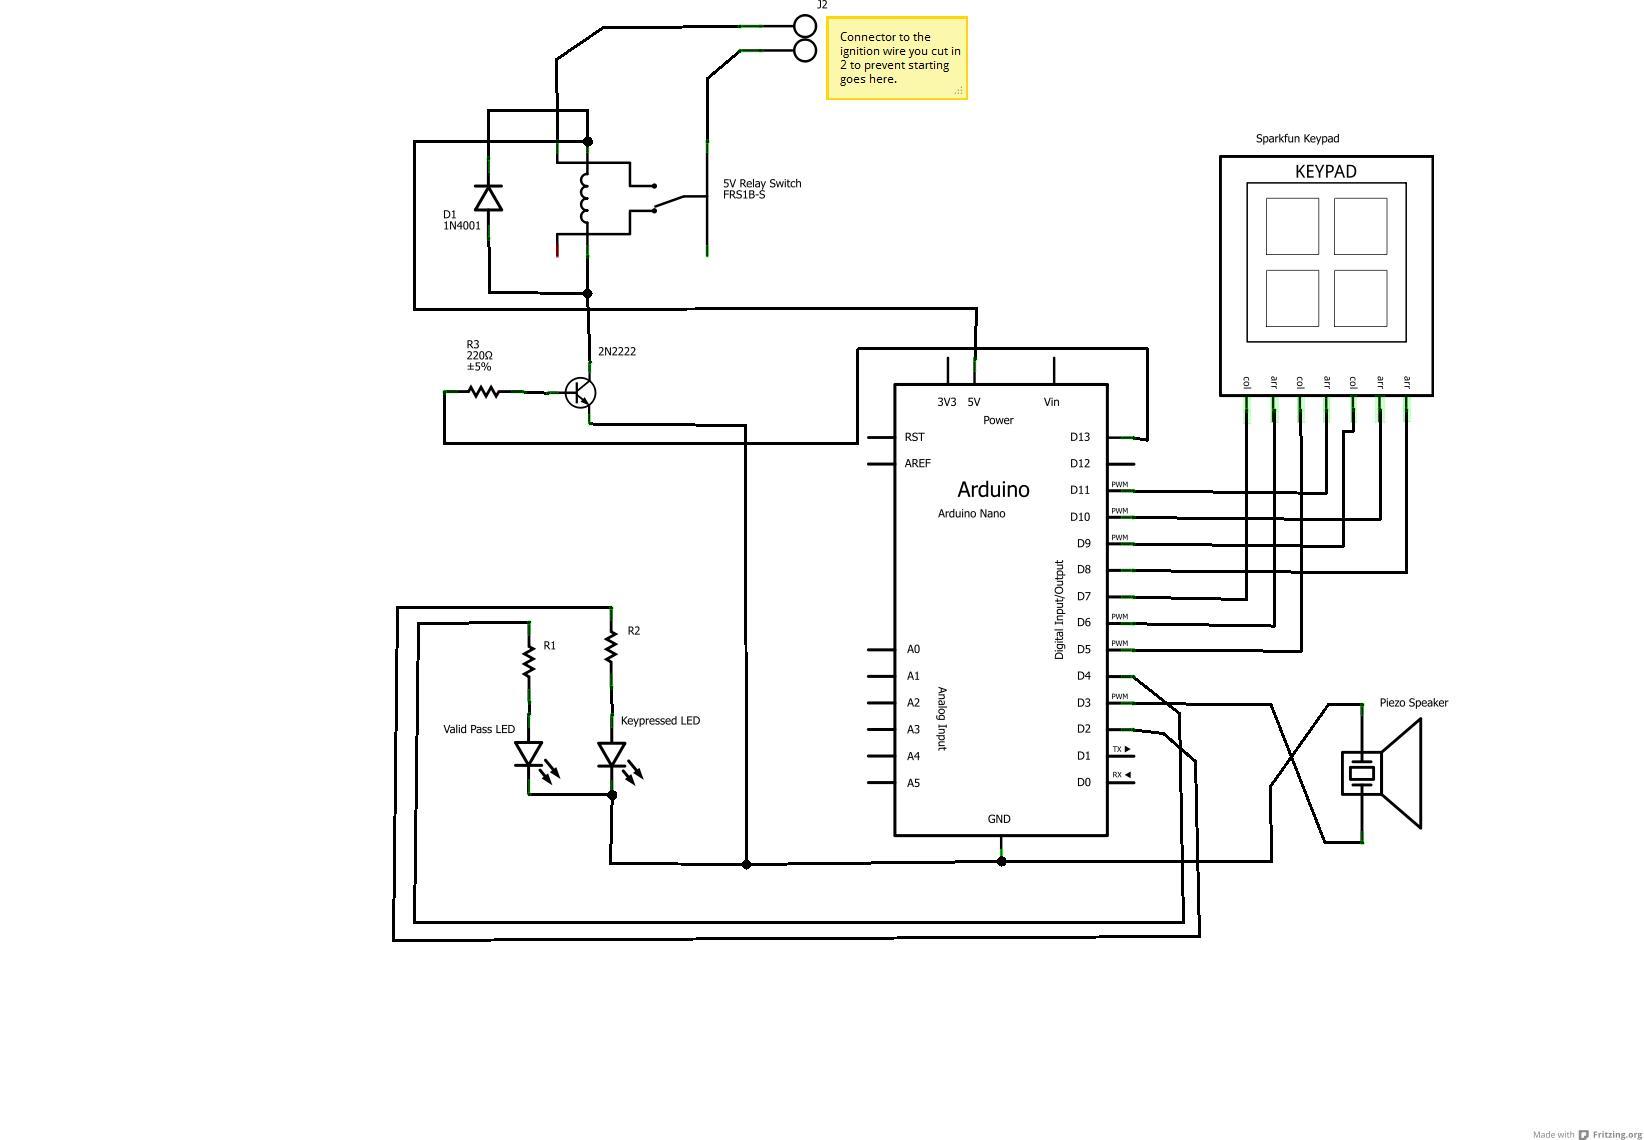 bluetooth headset circuit diagram